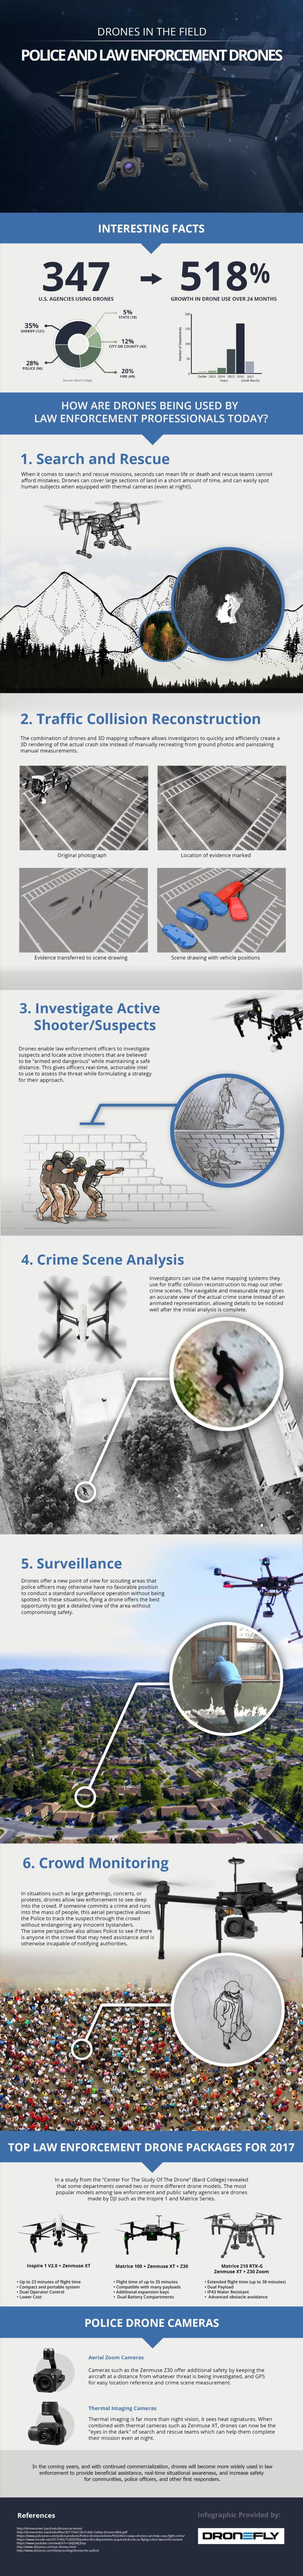 drone-infographic-e1509973099528-4048bd64b437ee640b3e2c4b93ab90d972a4b2f2